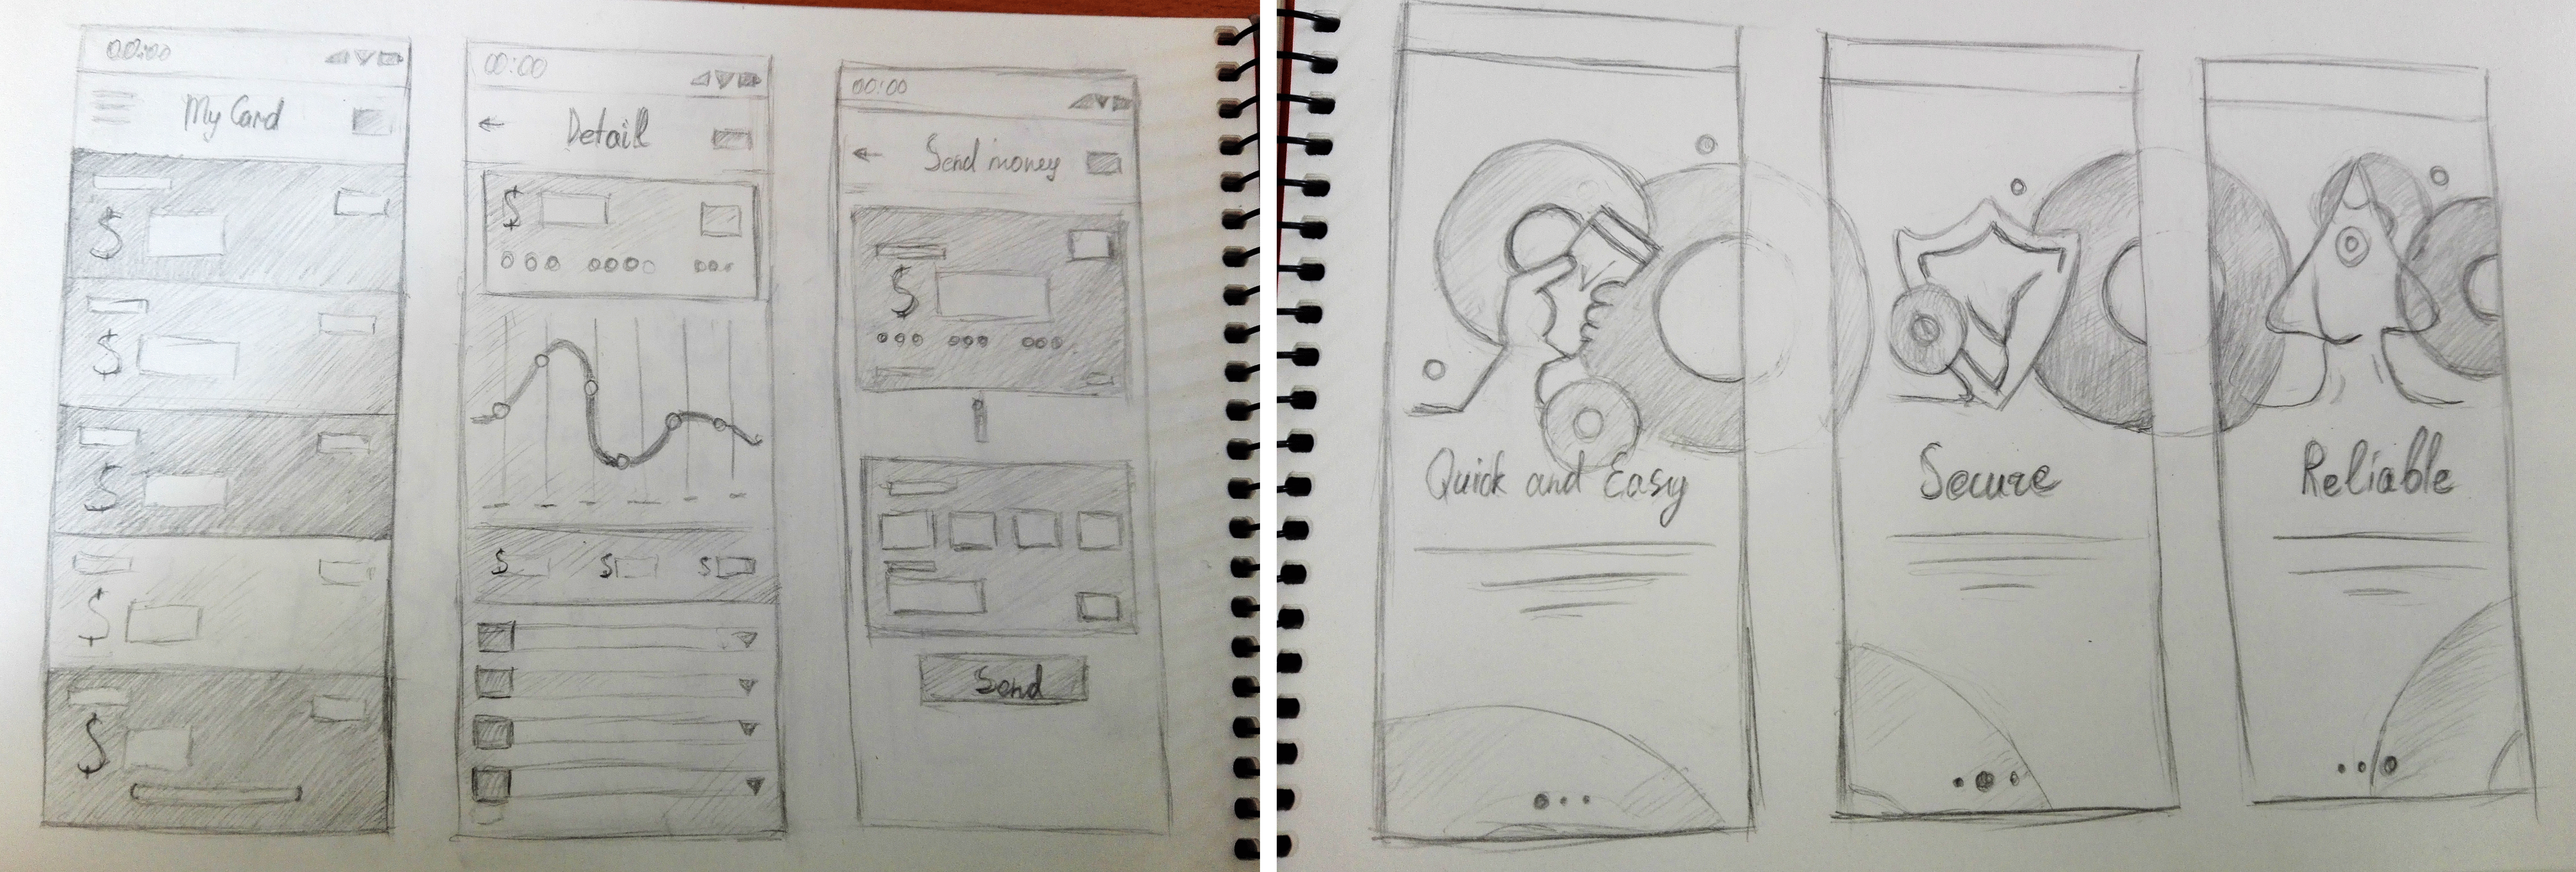 App Design: Sketches Example